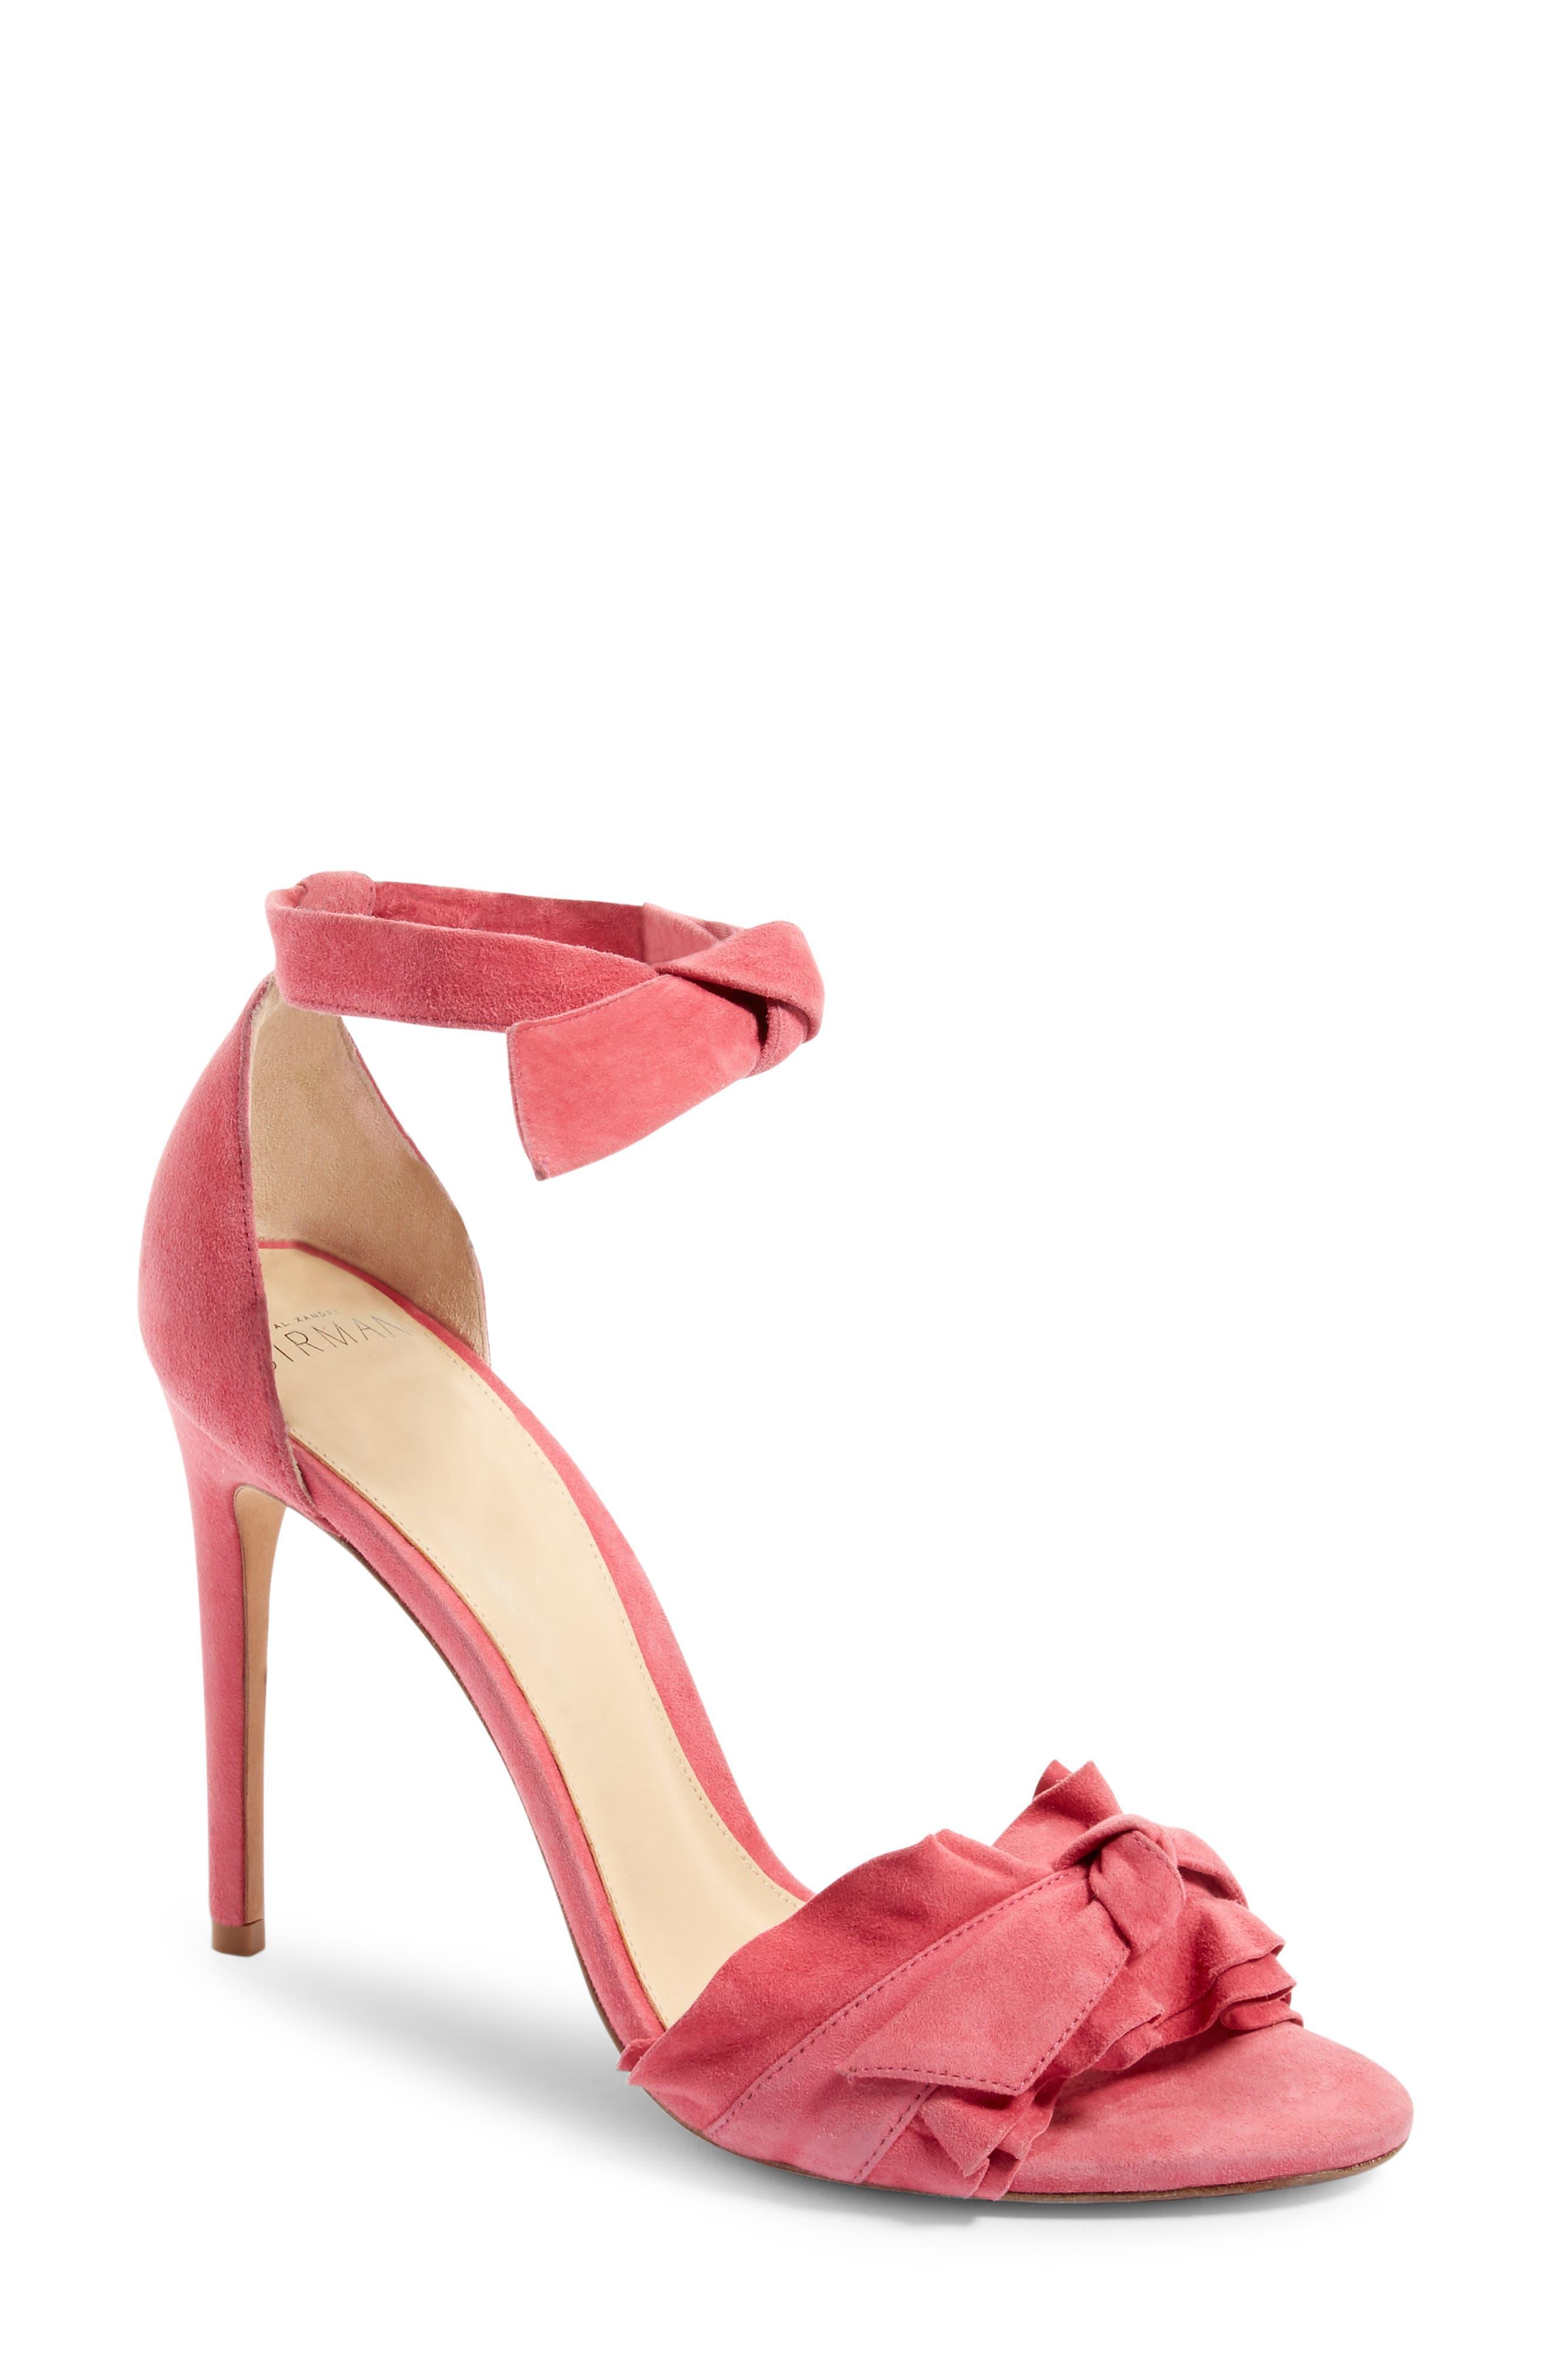 ALEXANDRE BIRMAN Lupita Ankle Tie Sandal